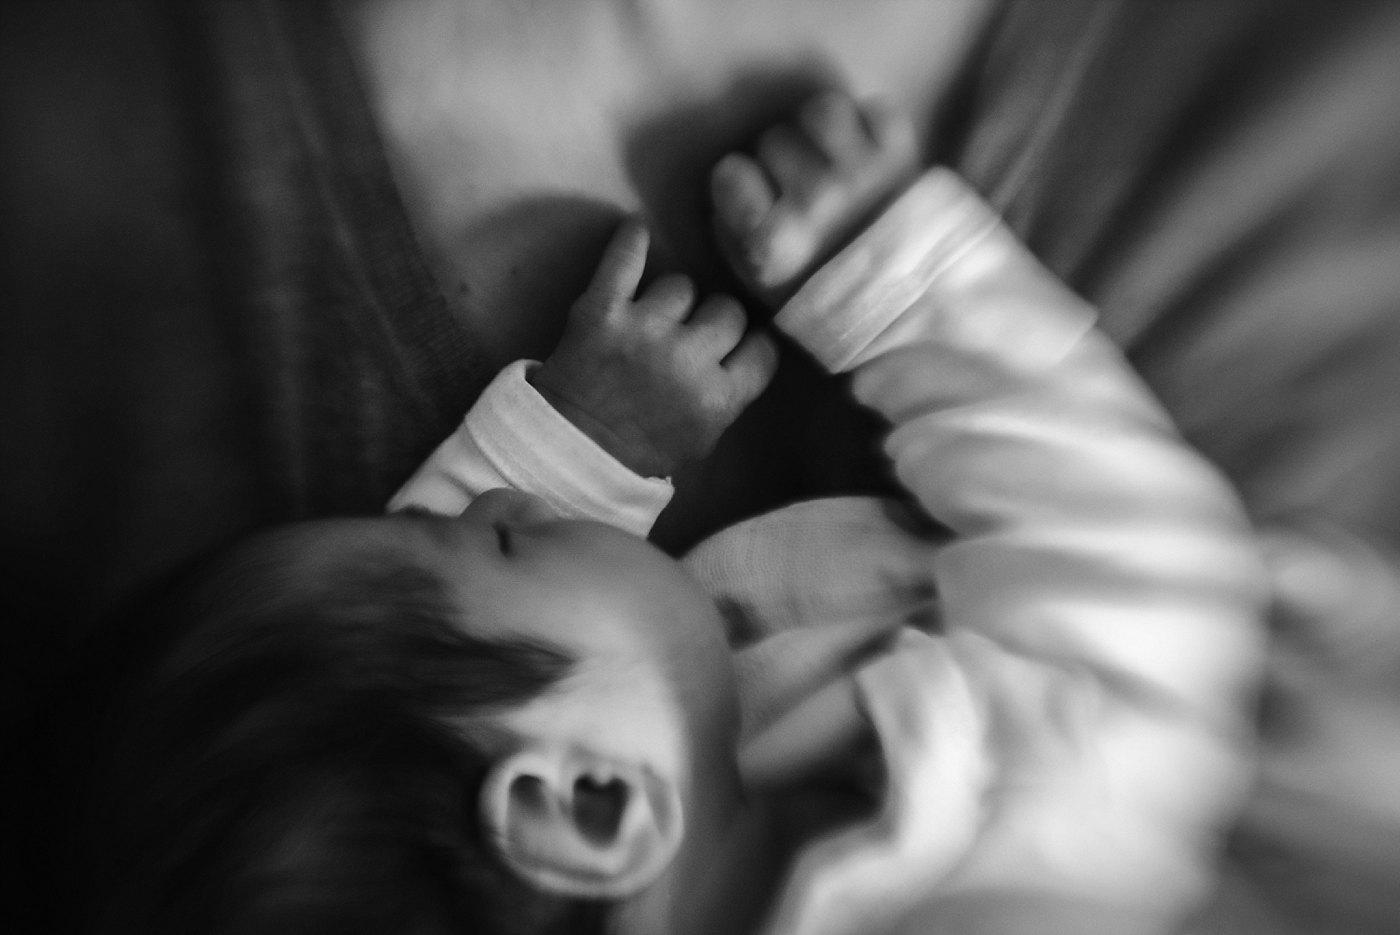 newborn fingers and hands redlands newborn photographer